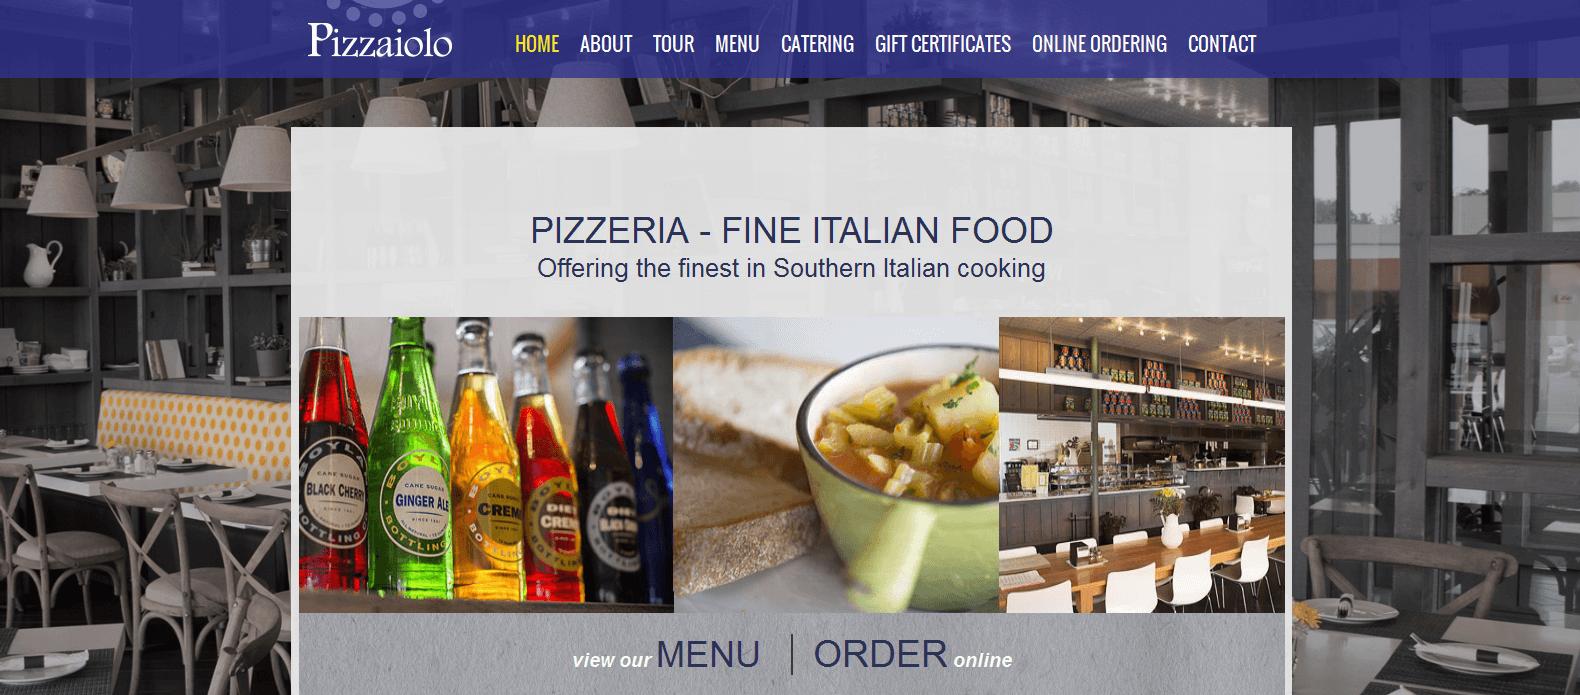 Pizzaiolo Italian Restaurant Midland Park NJ